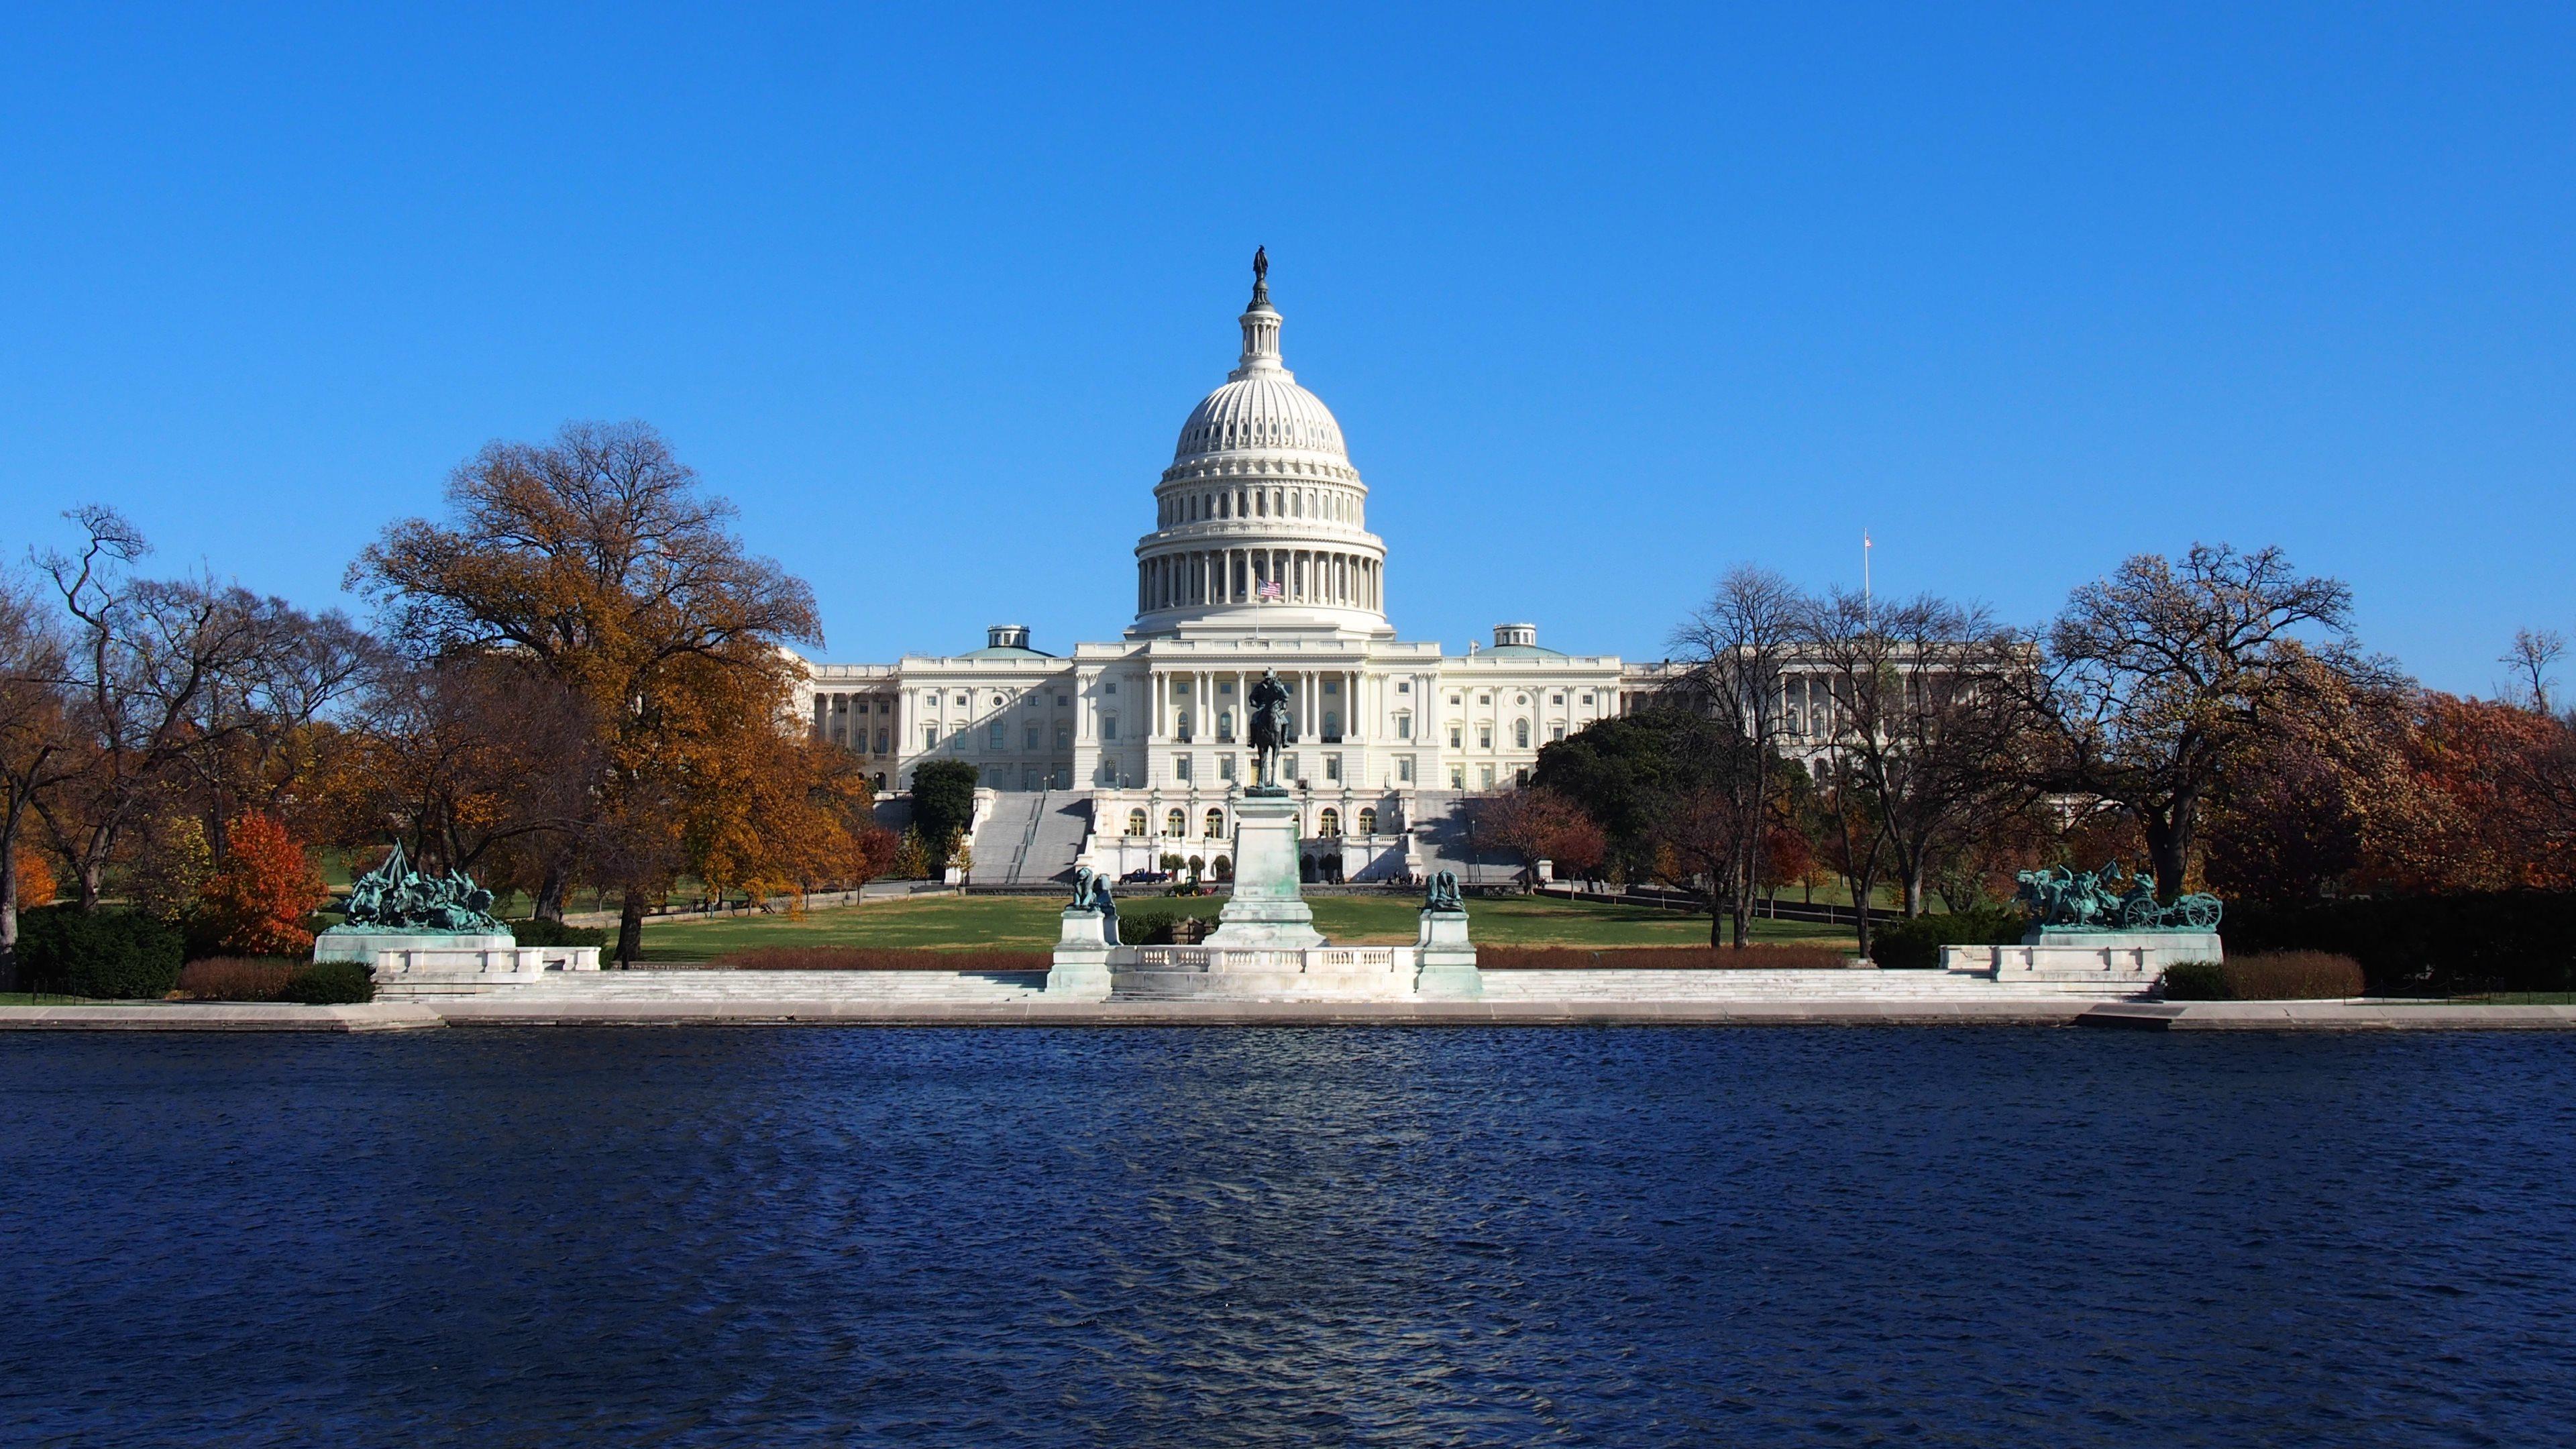 United States Capitol Wallpaper 25   3840 X 2160 stmednet 3840x2160